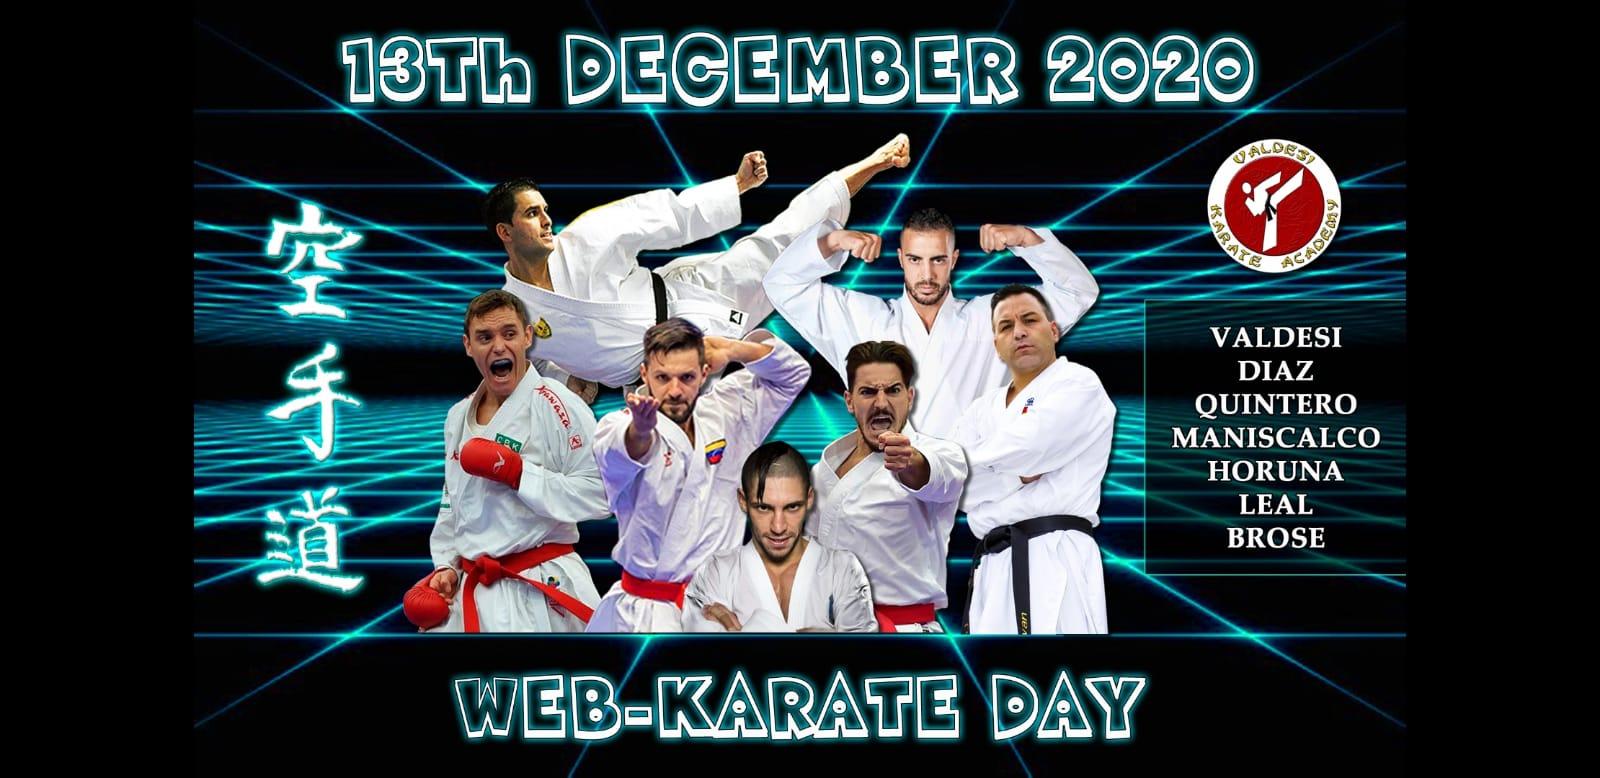 Web Karate Day - Session Kata - Diaz